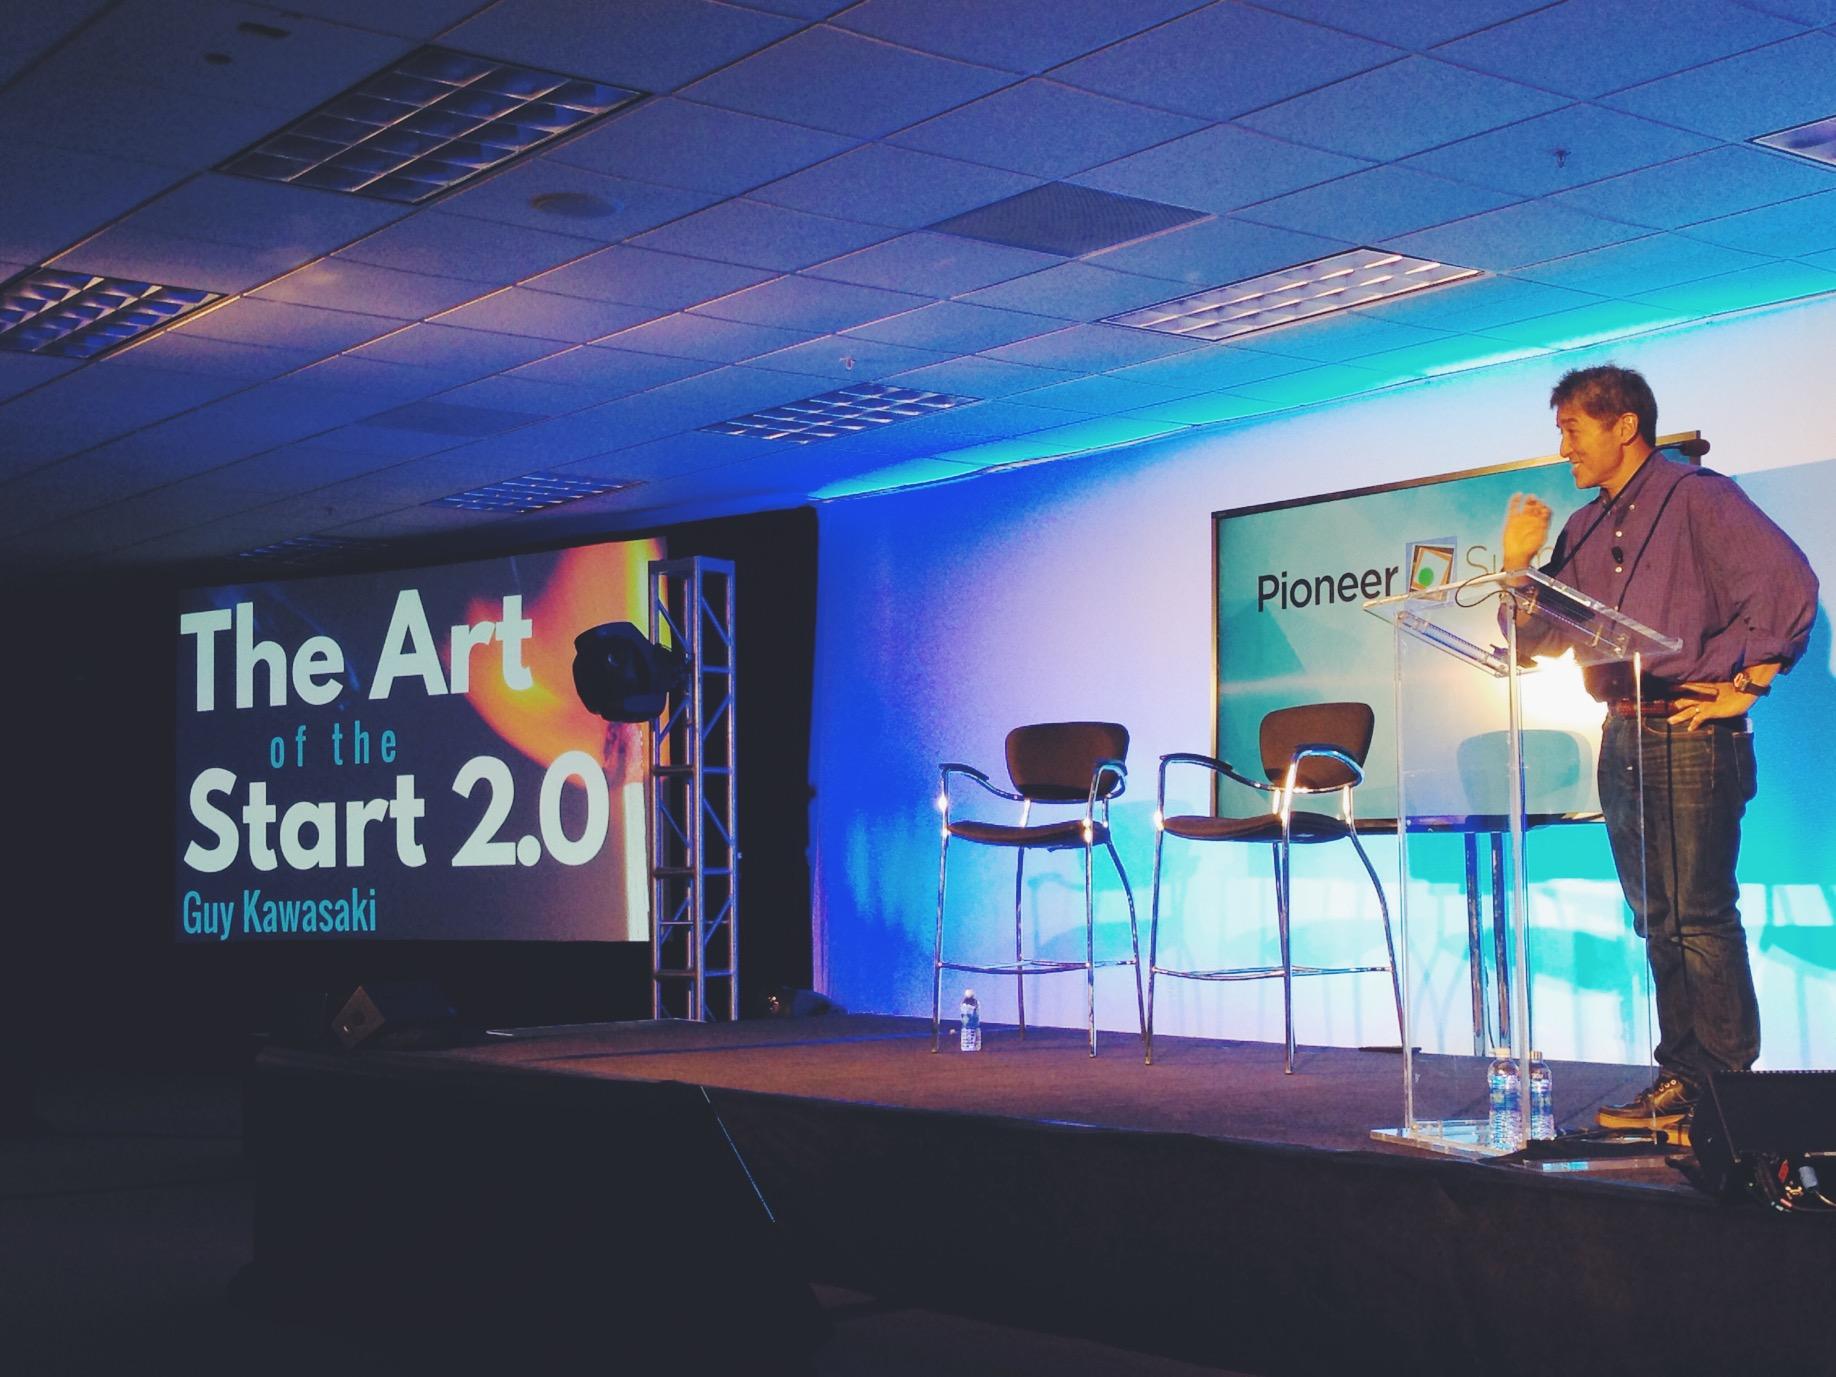 Guy Kawasaki - The art of te start - pioneer summit